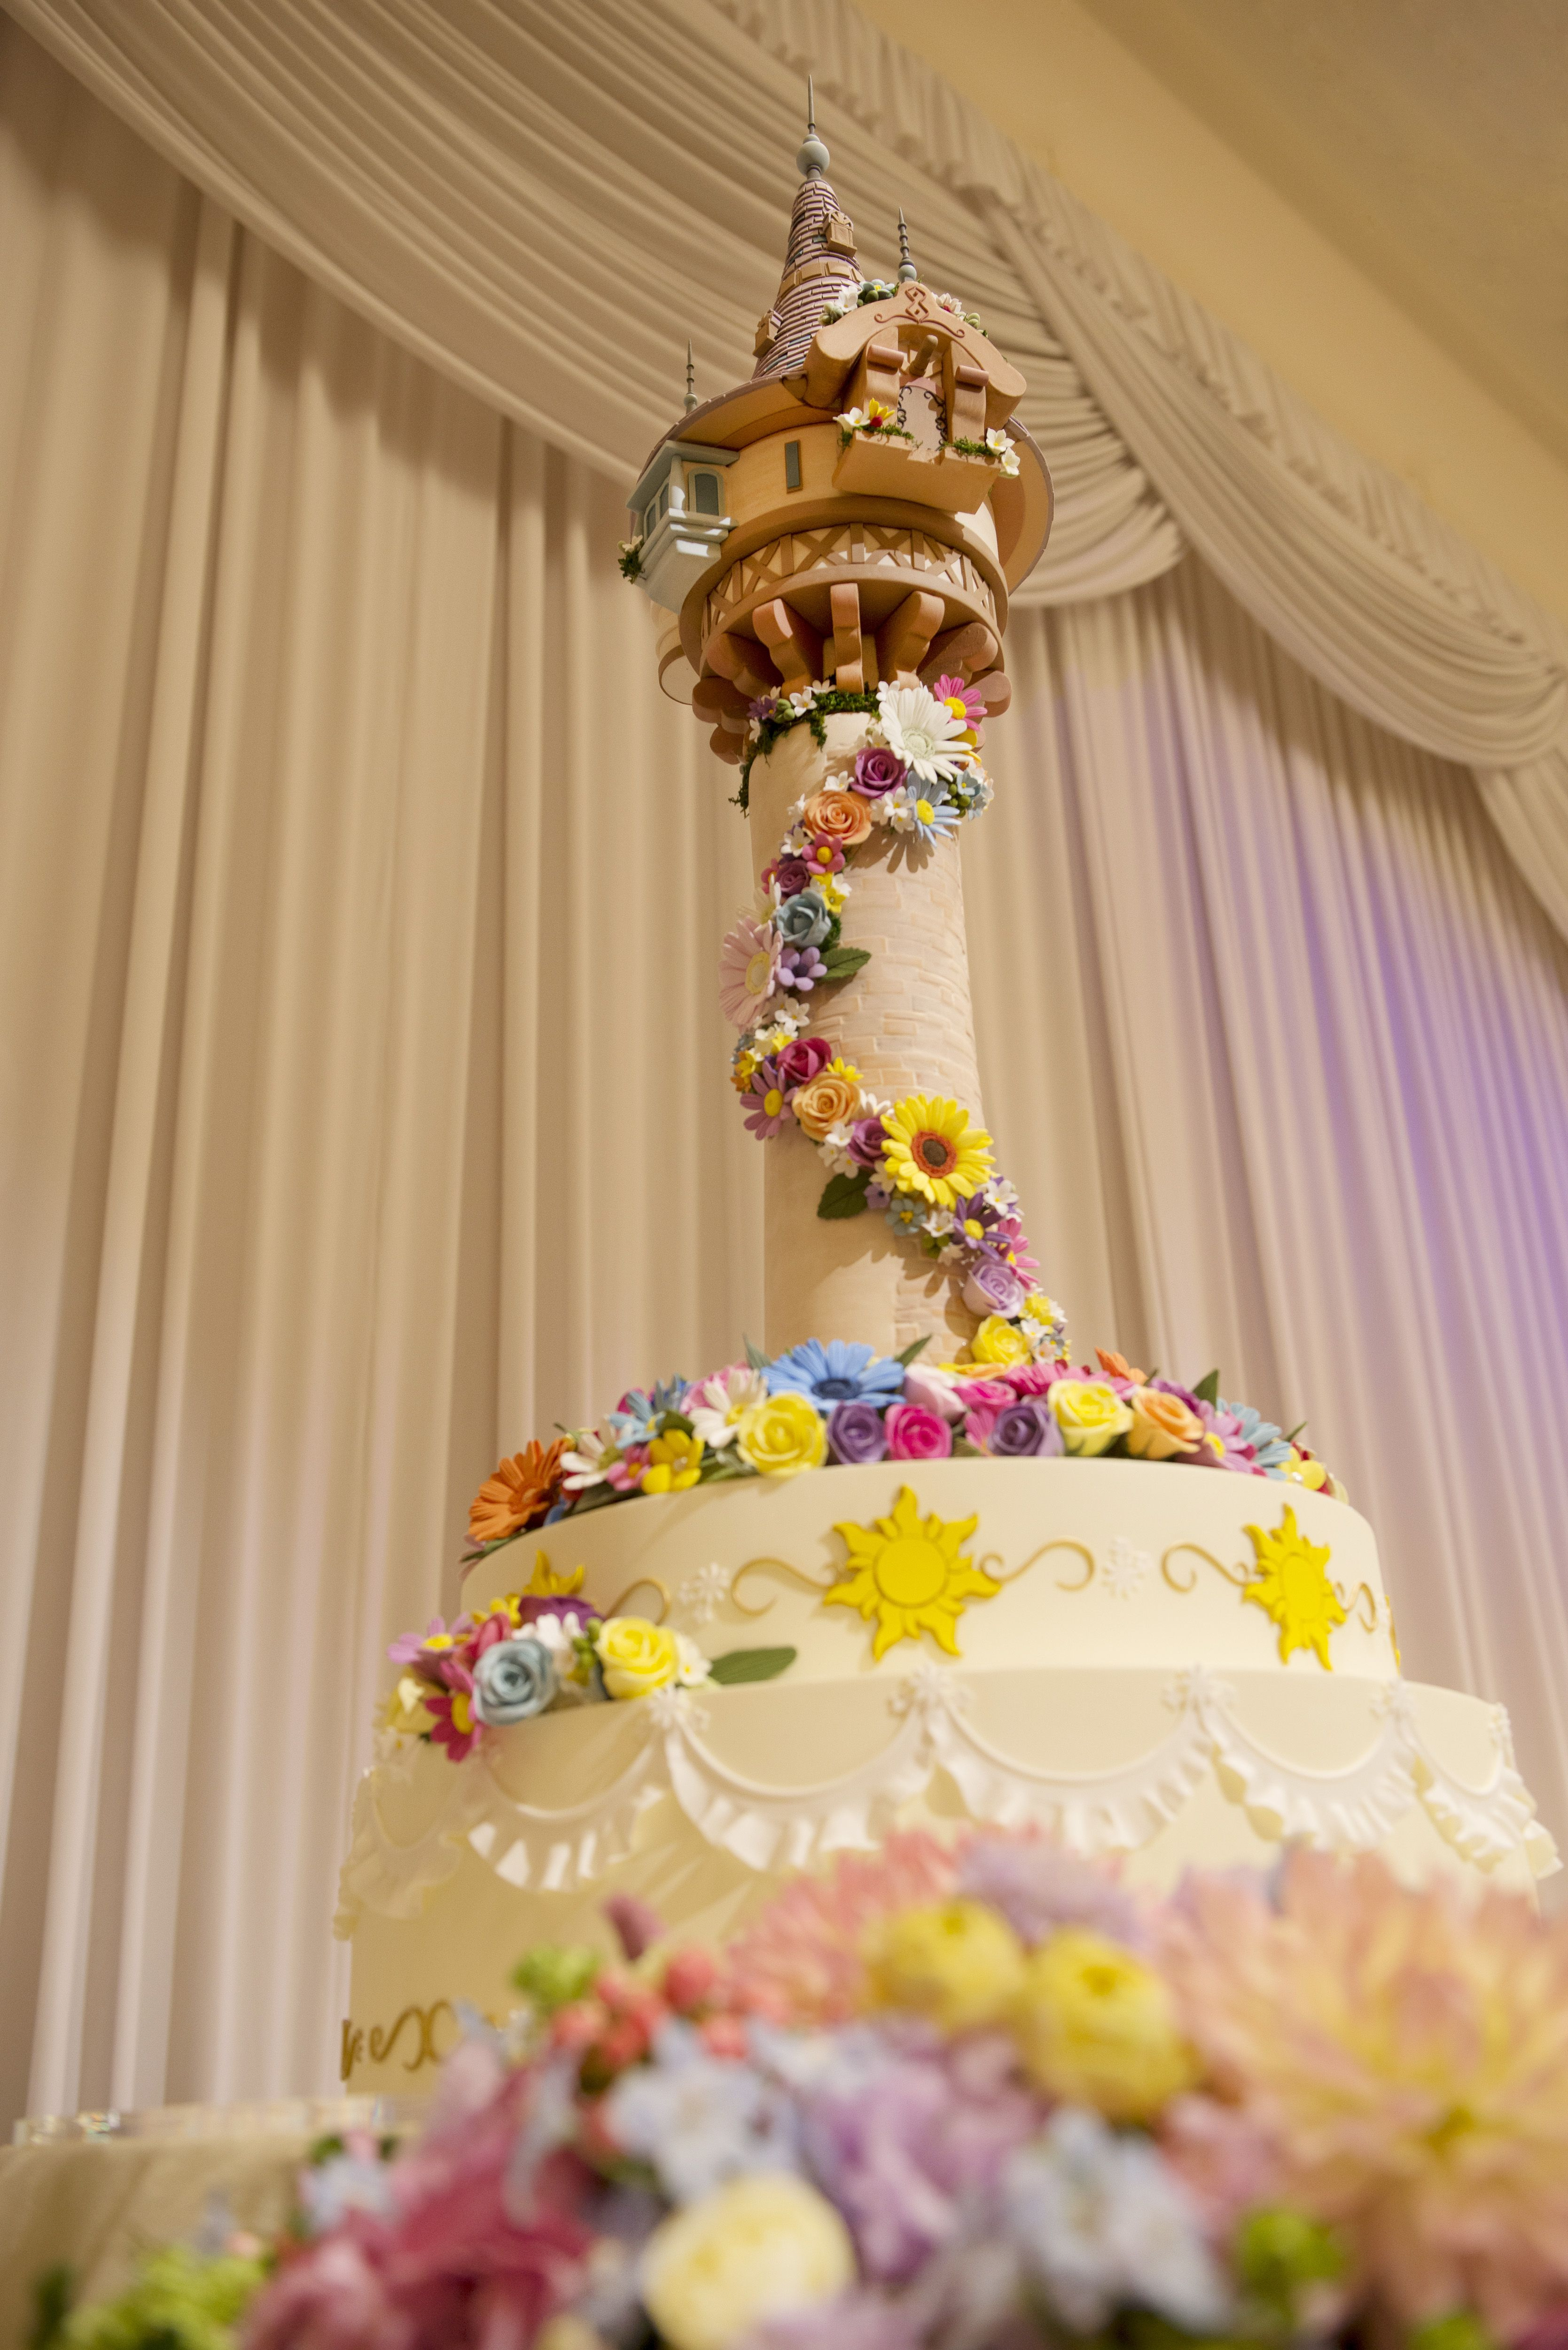 Lo becessito para mi boda | Tortas | Pinterest | Wedding cake ...